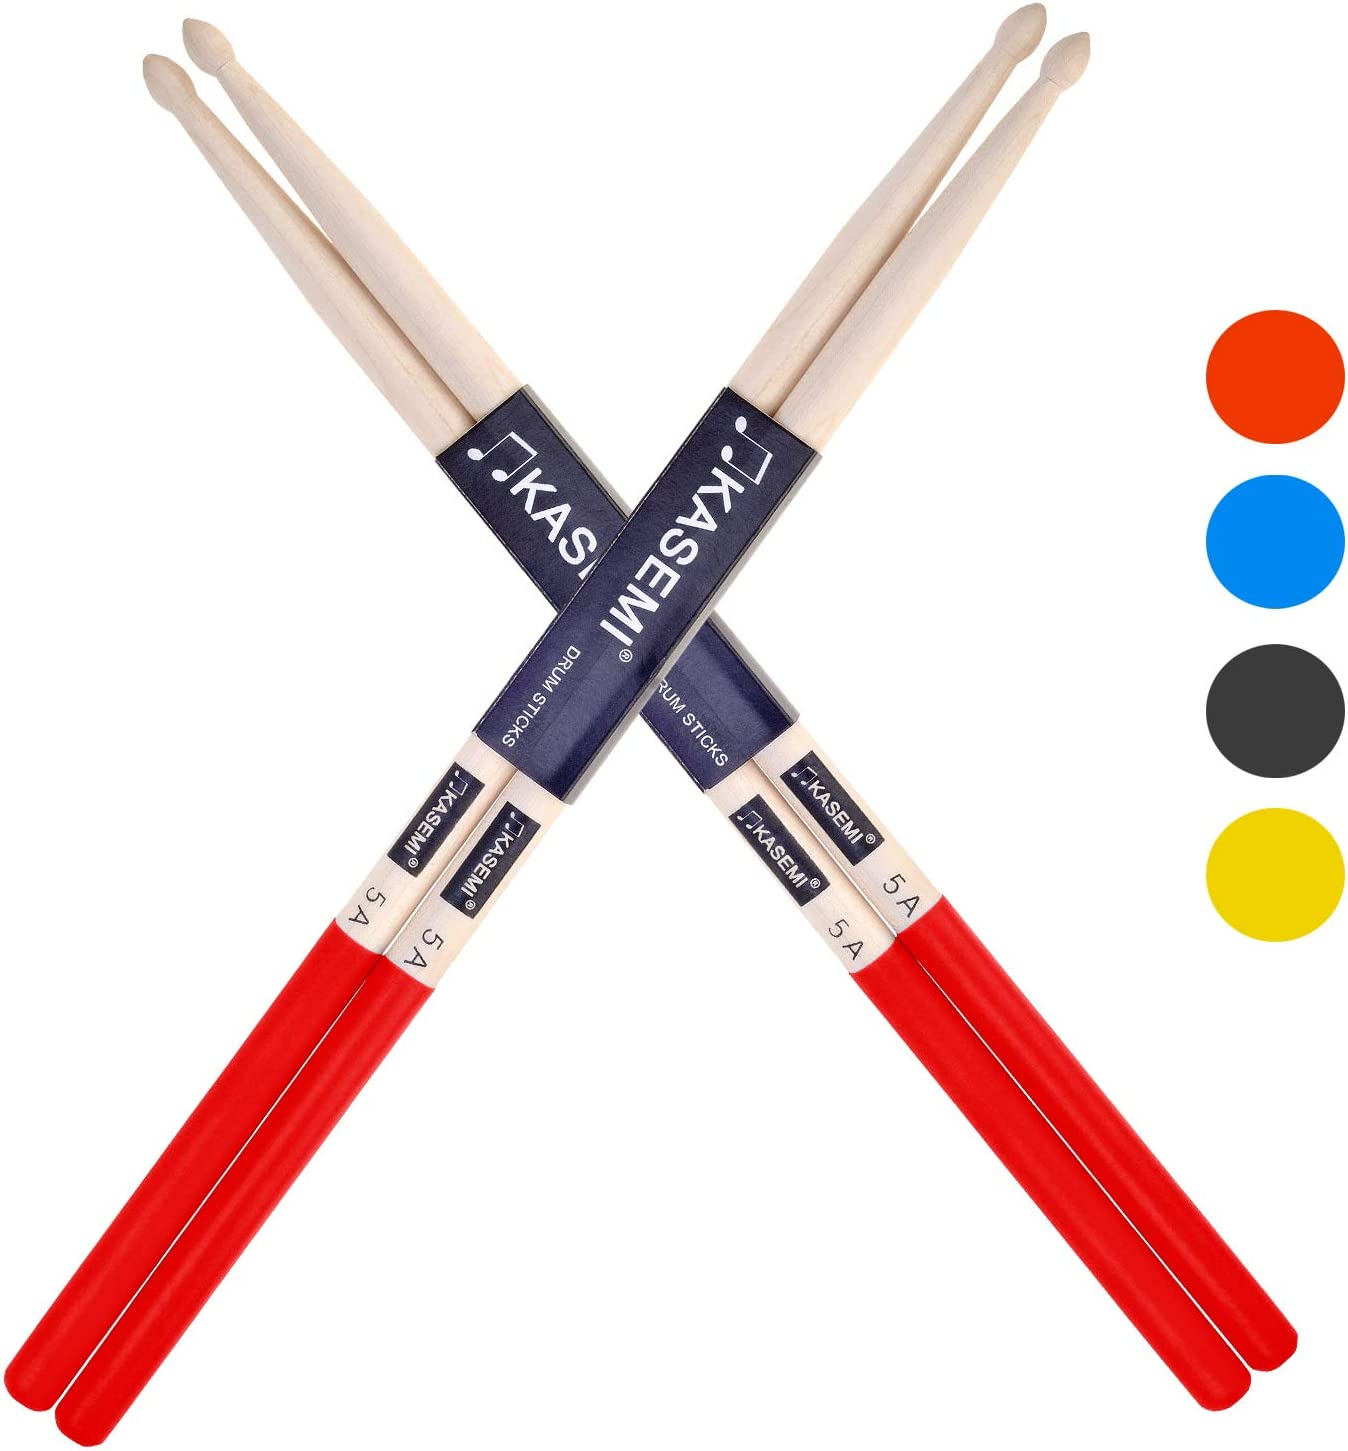 KASEMI Drum Sticks Non-Slip, 5A Wood Tip Drumstick (2 Pair)